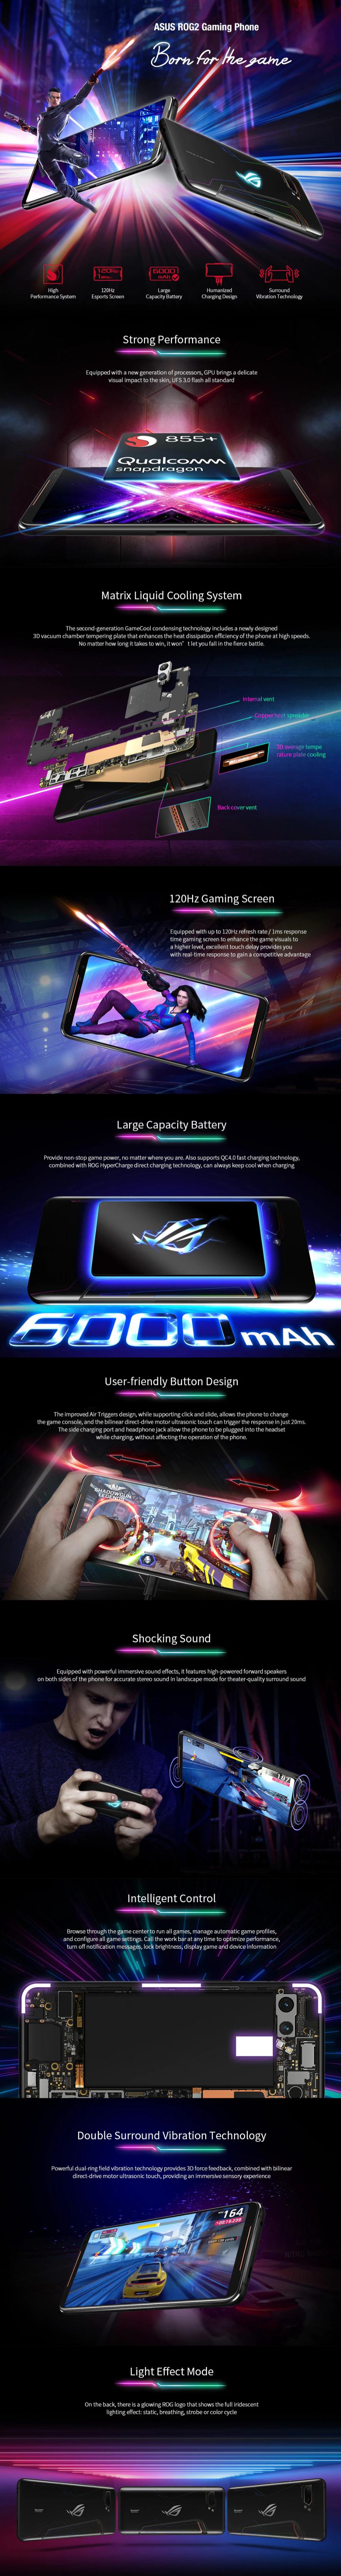 ASUS ROG2 Gaming Phone 4G Phablet